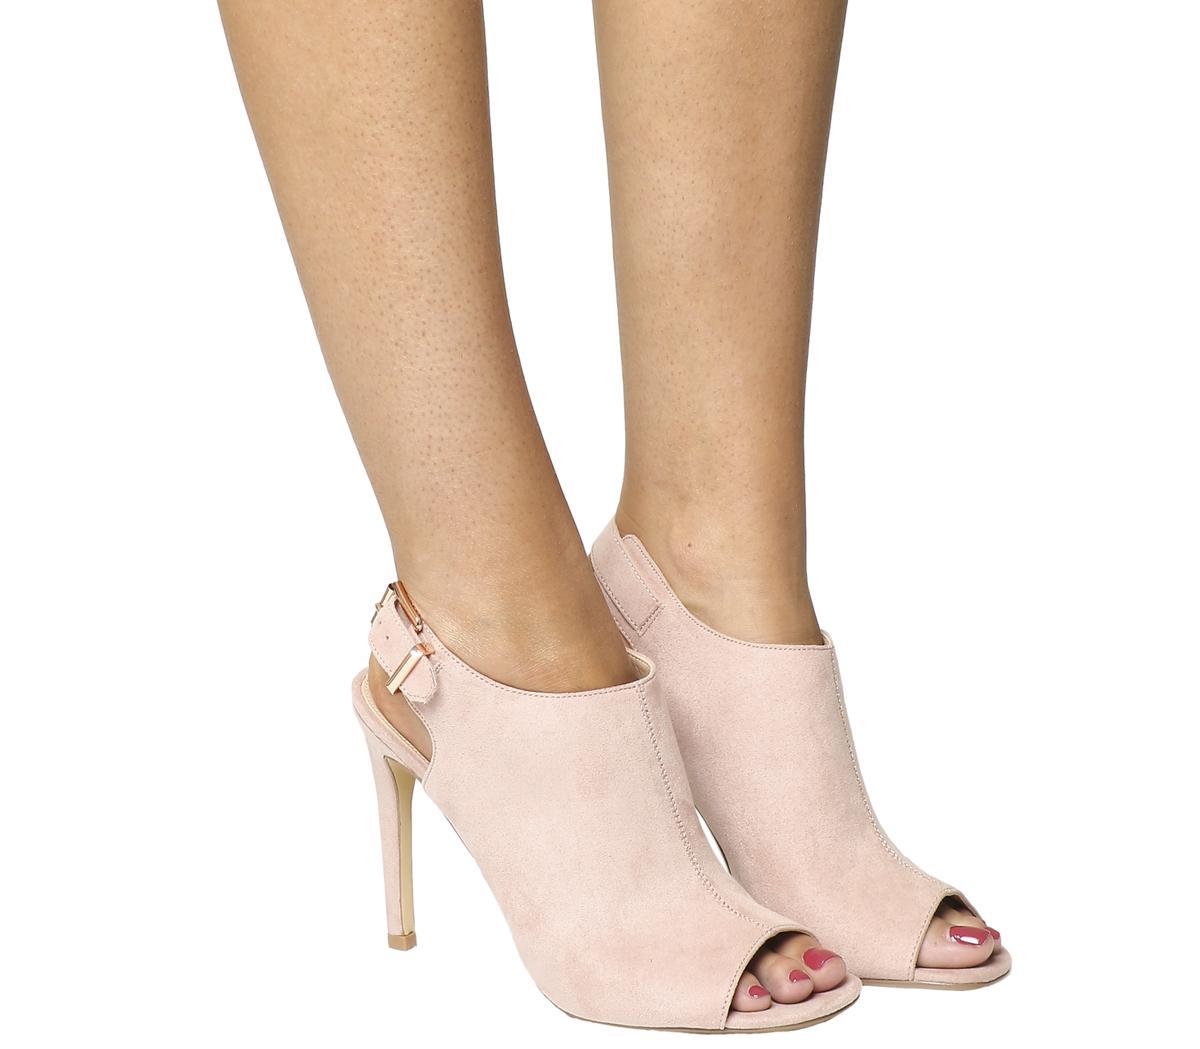 Heist Peep Toe Shoe Boots